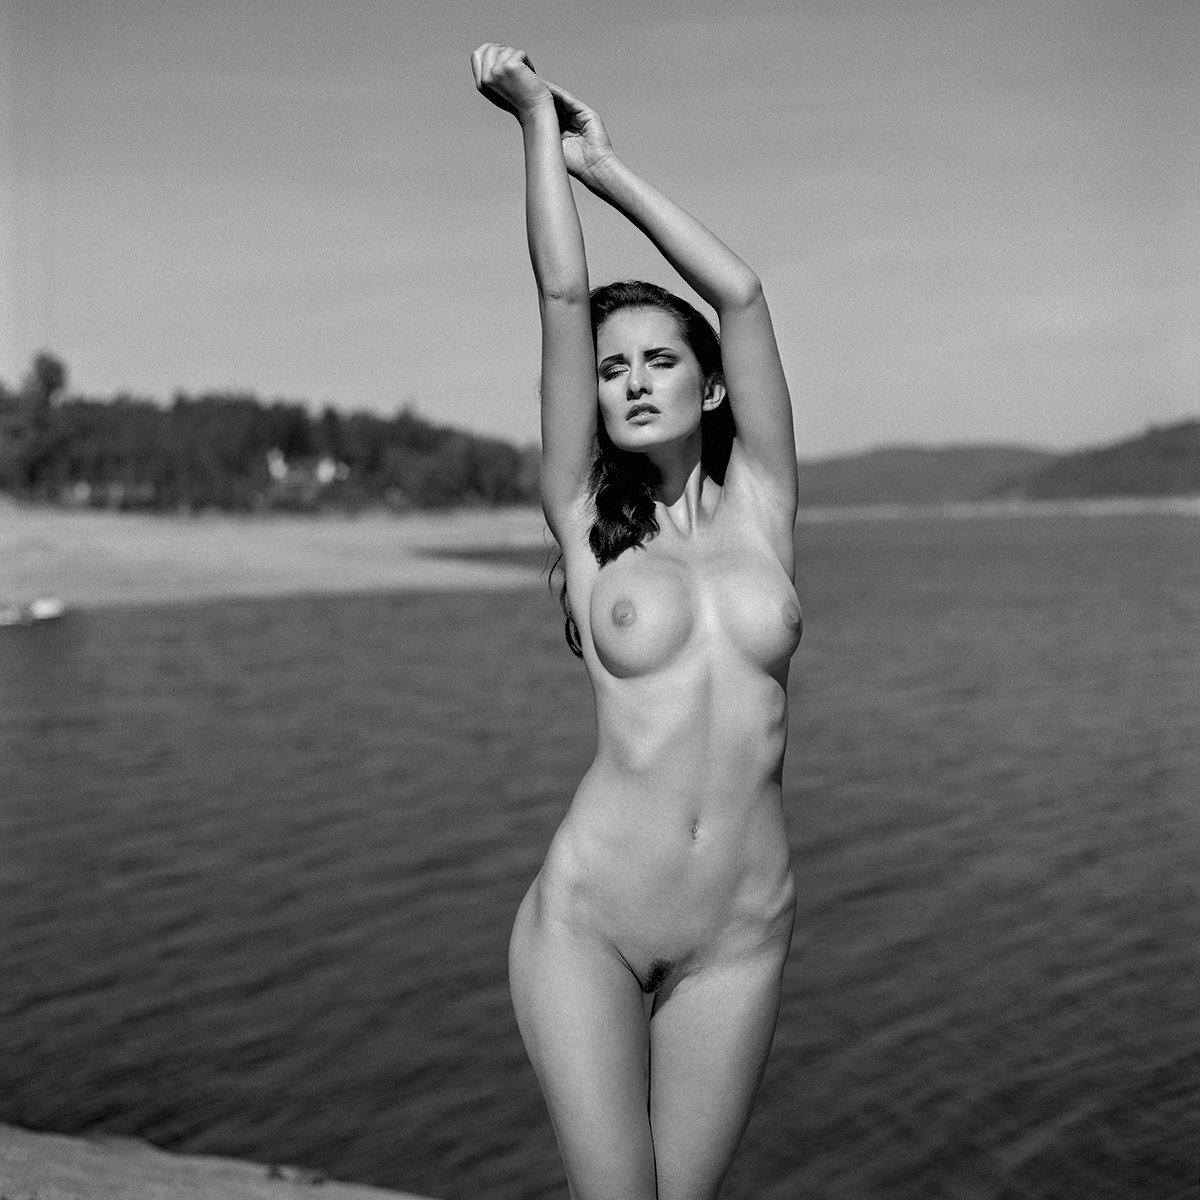 akt, nude, analog, women, hasselblad, ninoveron, fineart, bw, 6x6,, NinoVeron